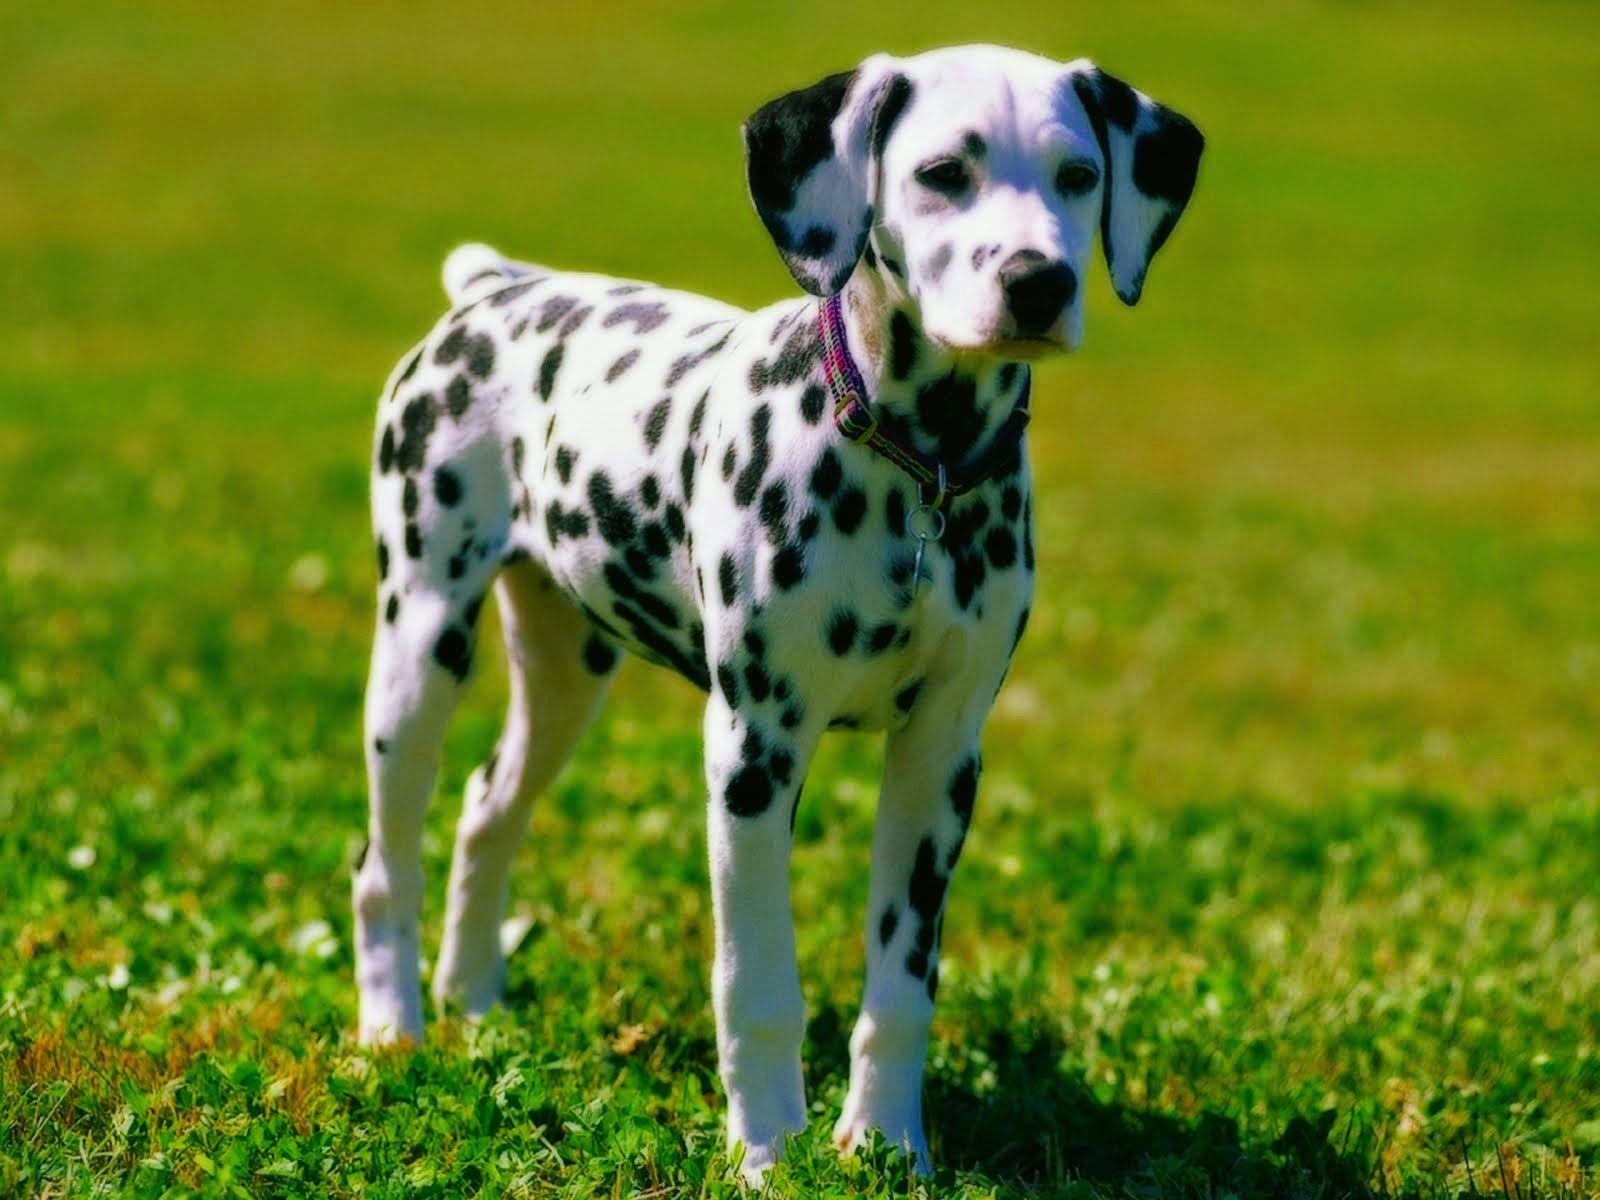 17 Best Images About Binatang On Pinterest Dalmatians Aliens